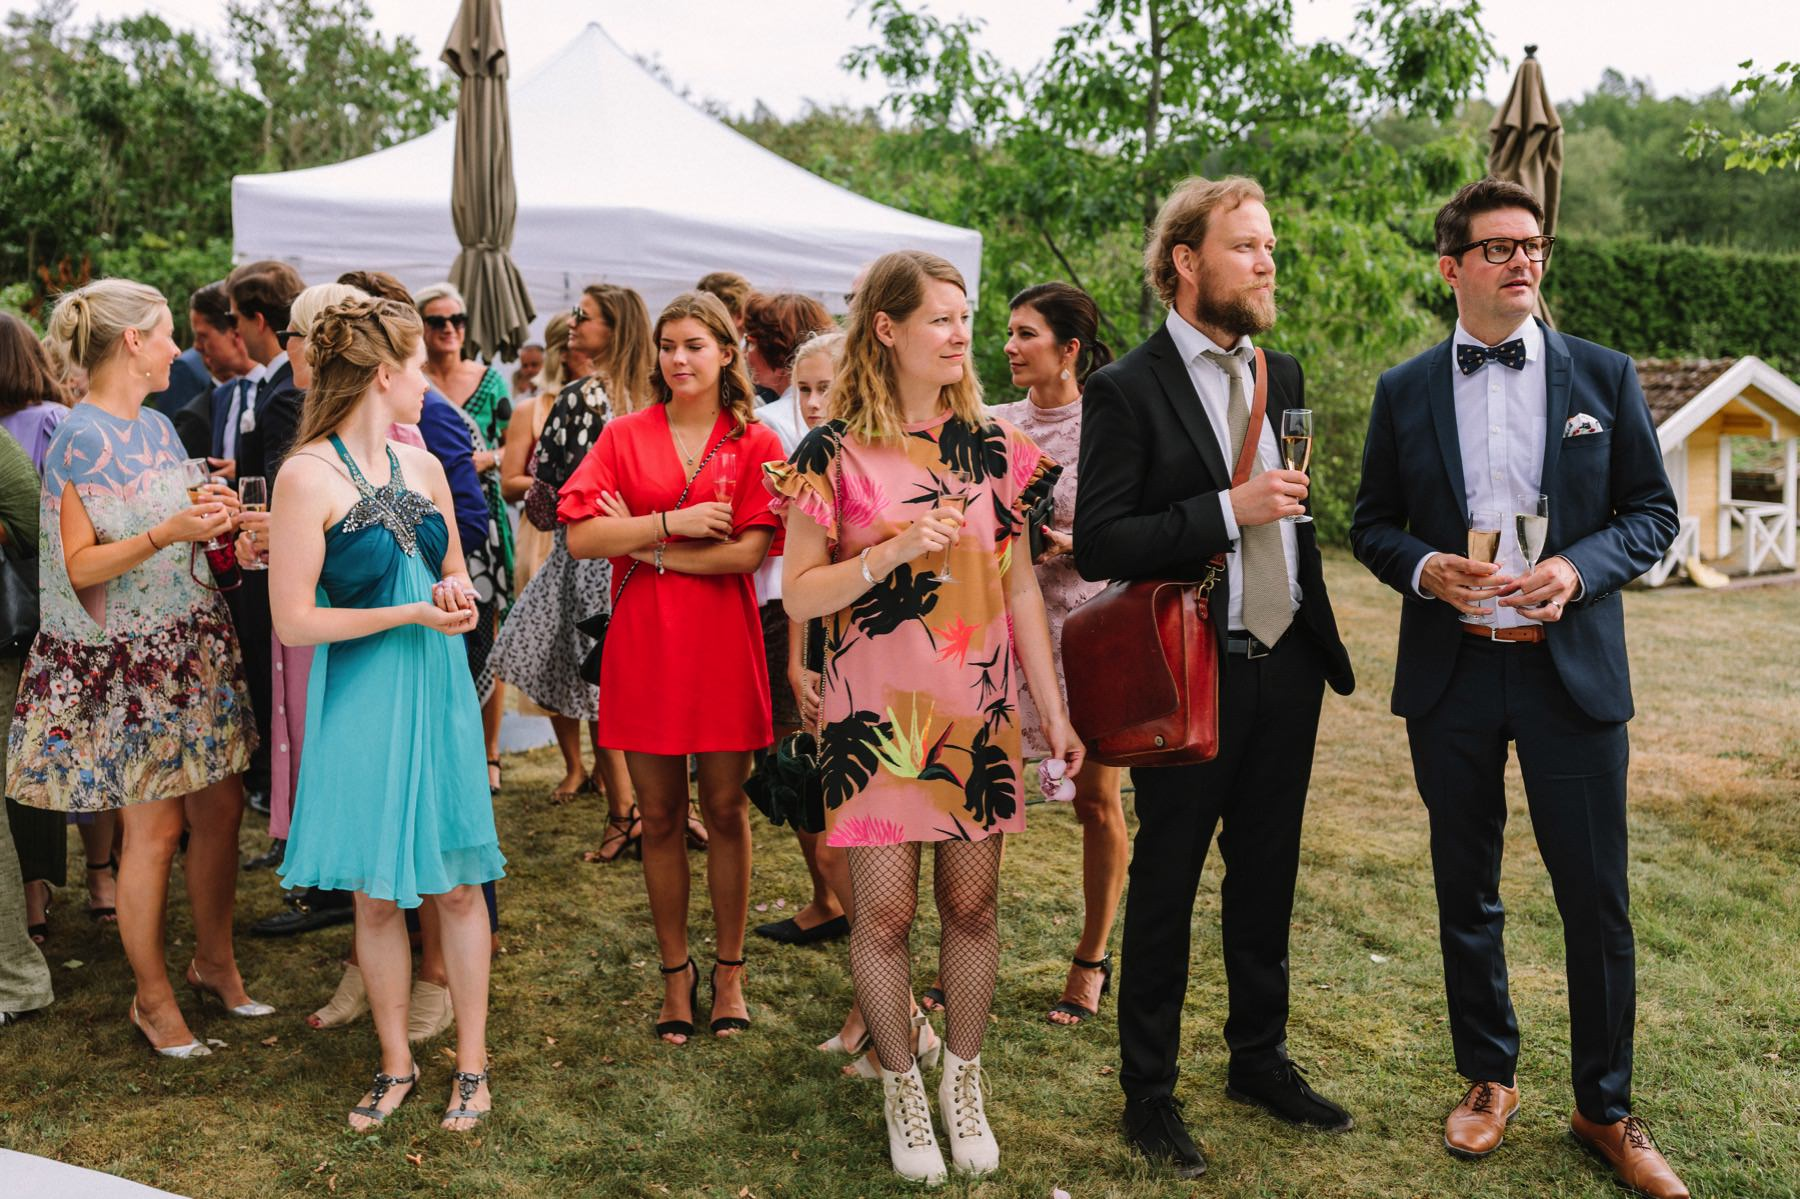 Finnish wedding